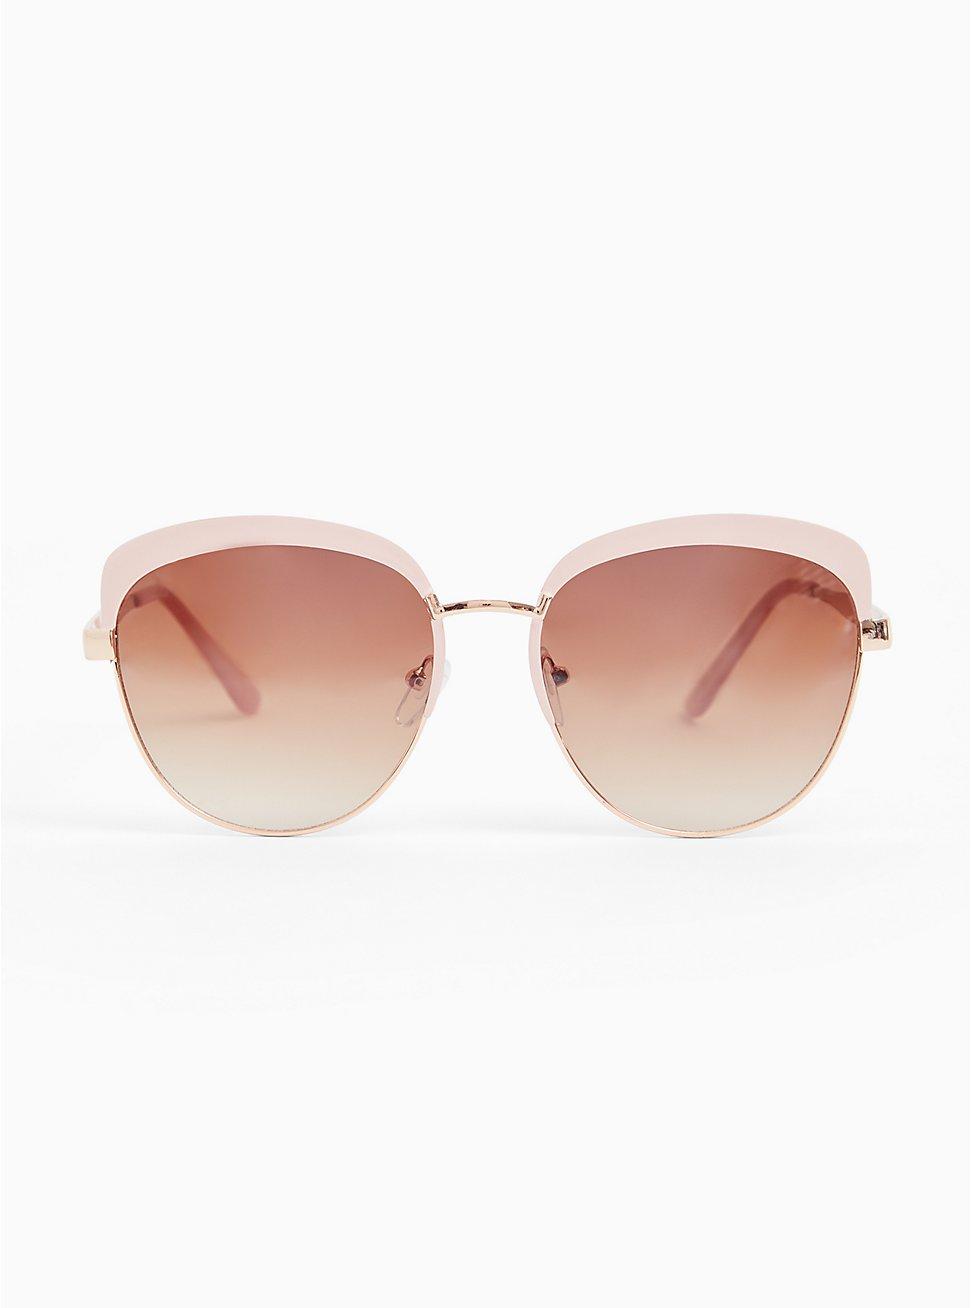 Blush Pink Cat Eye Sunglasses, , hi-res